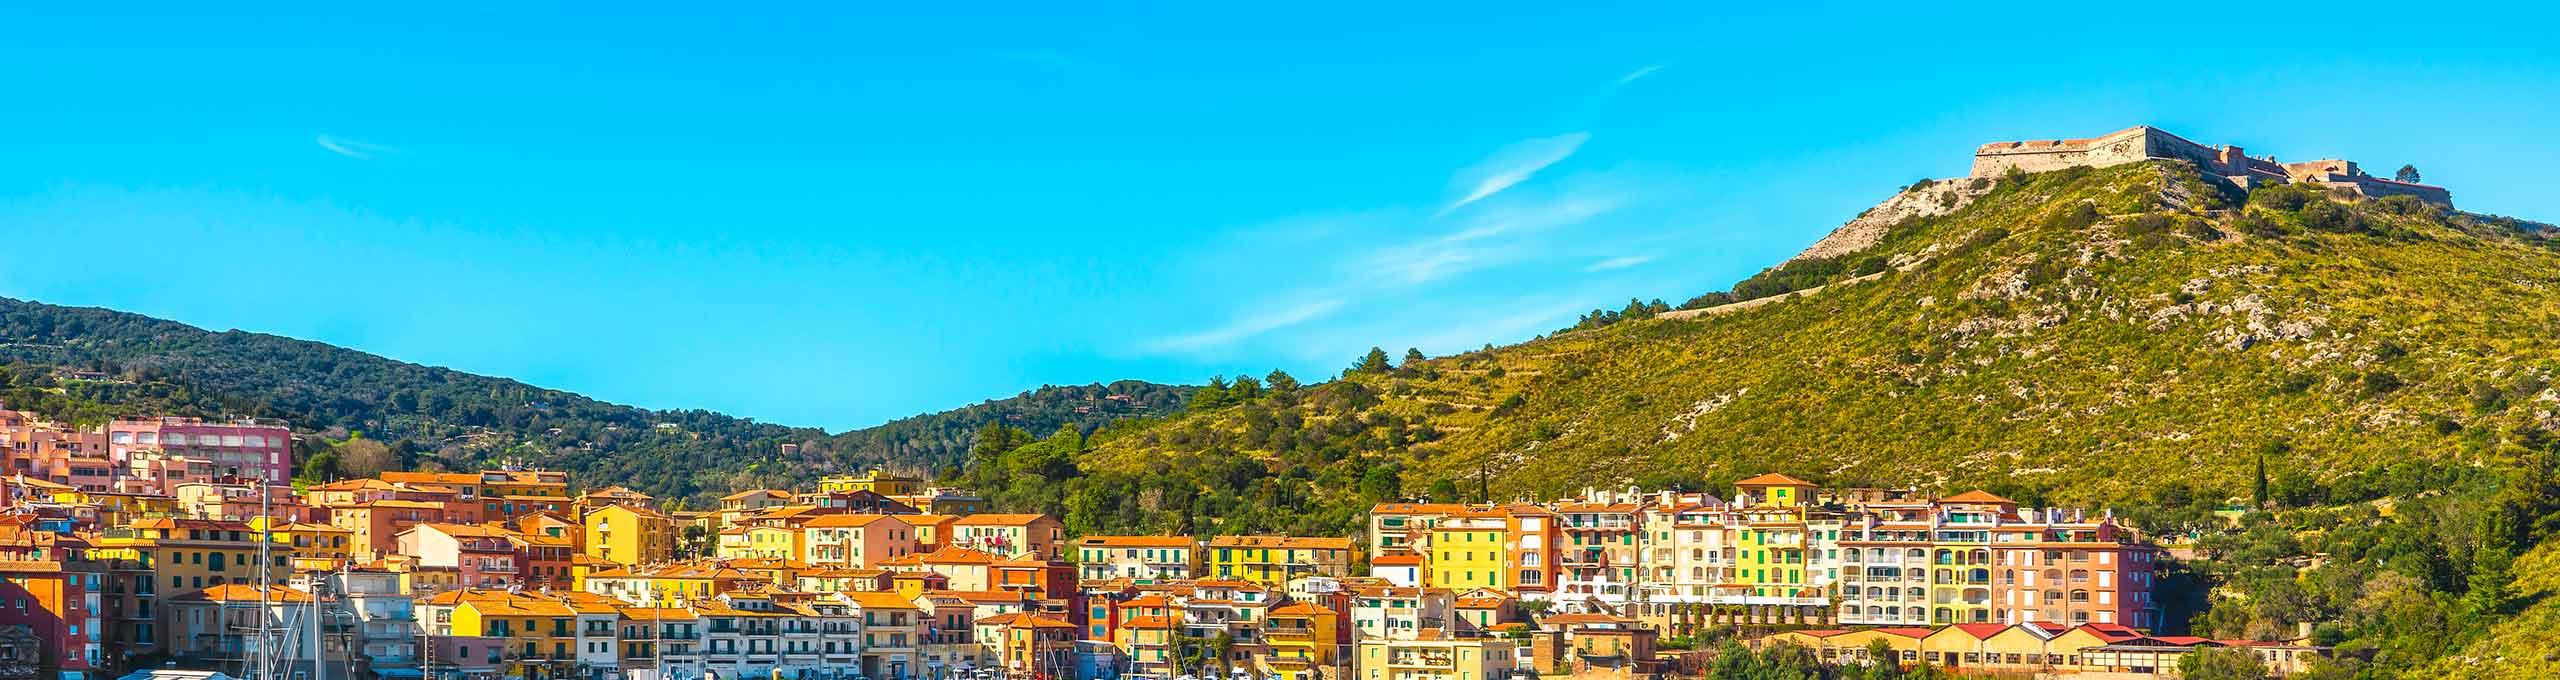 Monte Argentario, Maremma Toscana